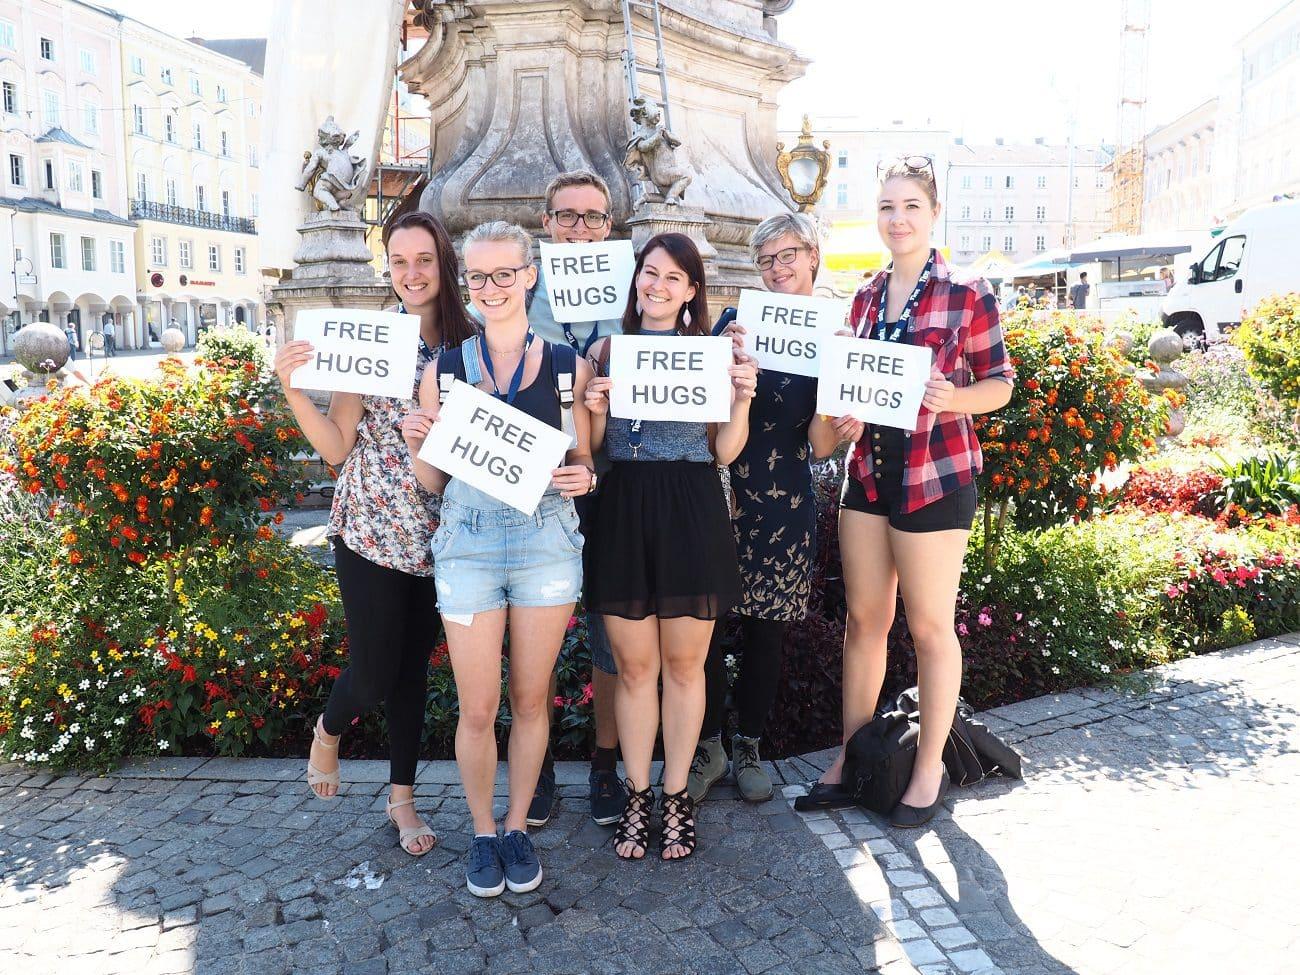 Share the love – Free Hugs für Linz